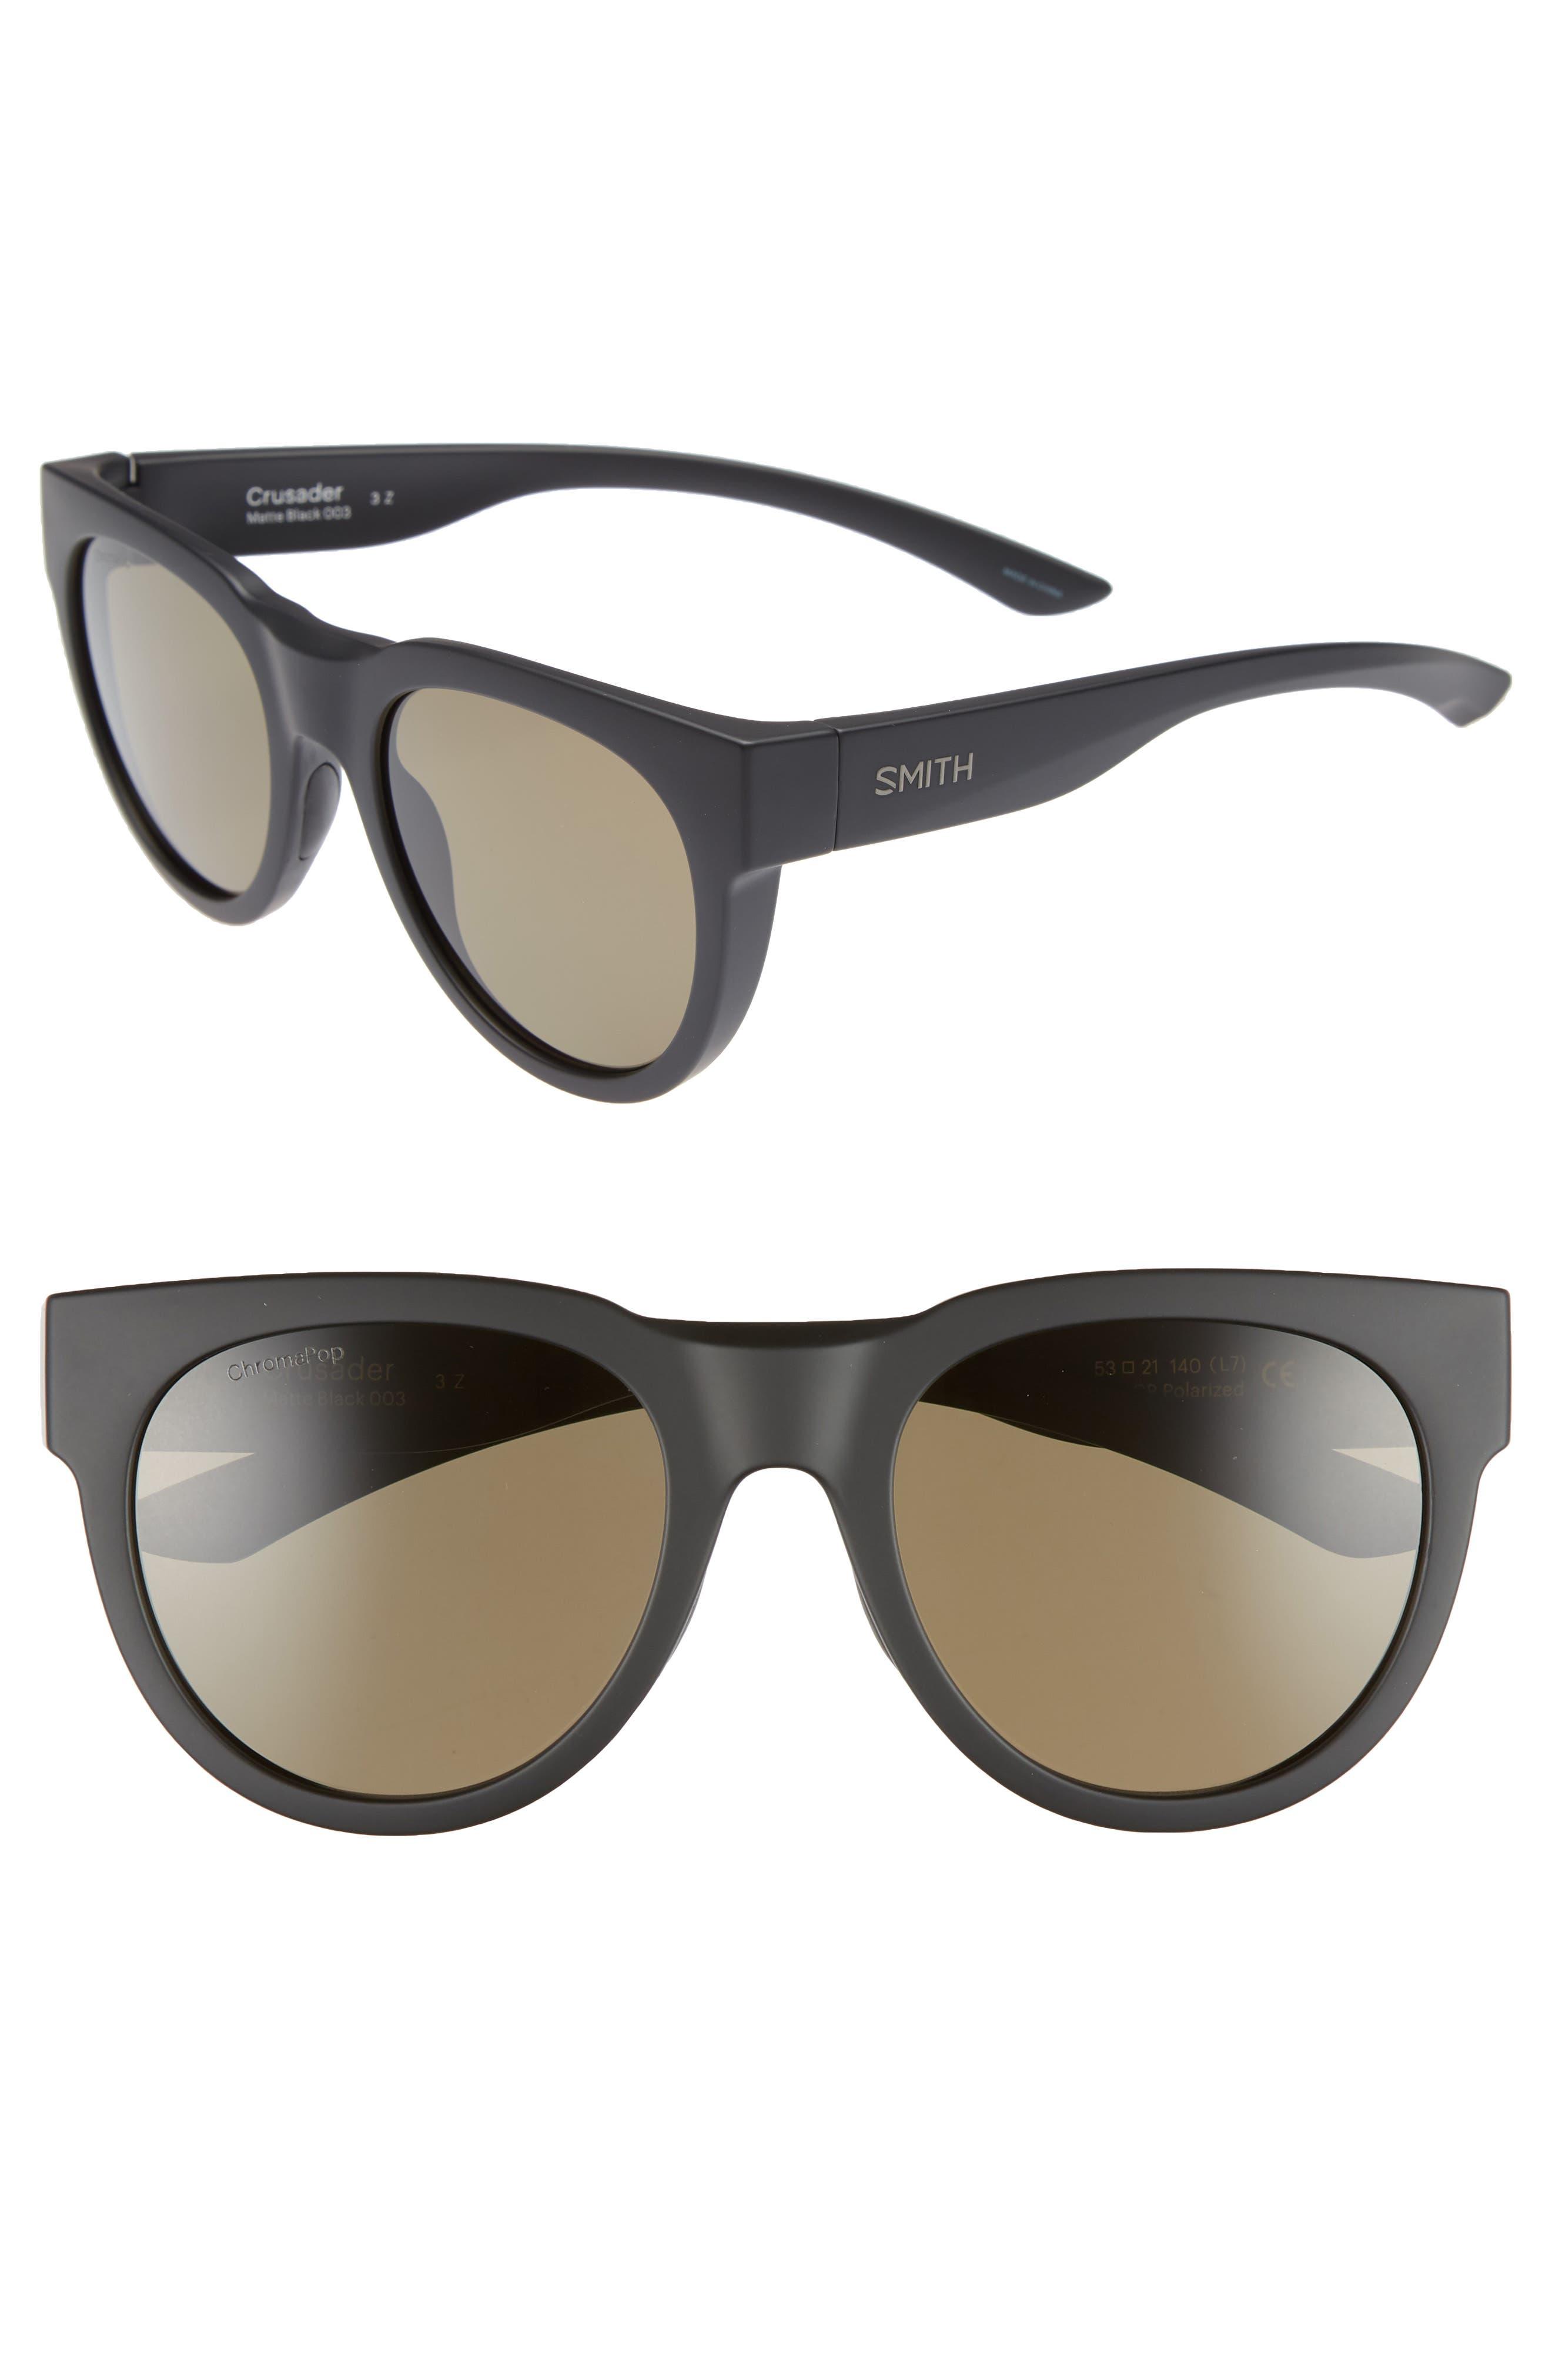 Crusader 53mm ChromaPop<sup>™</sup> Polarized Round Sunglasses,                         Main,                         color, MATTE BLACK/ GREY GREEN